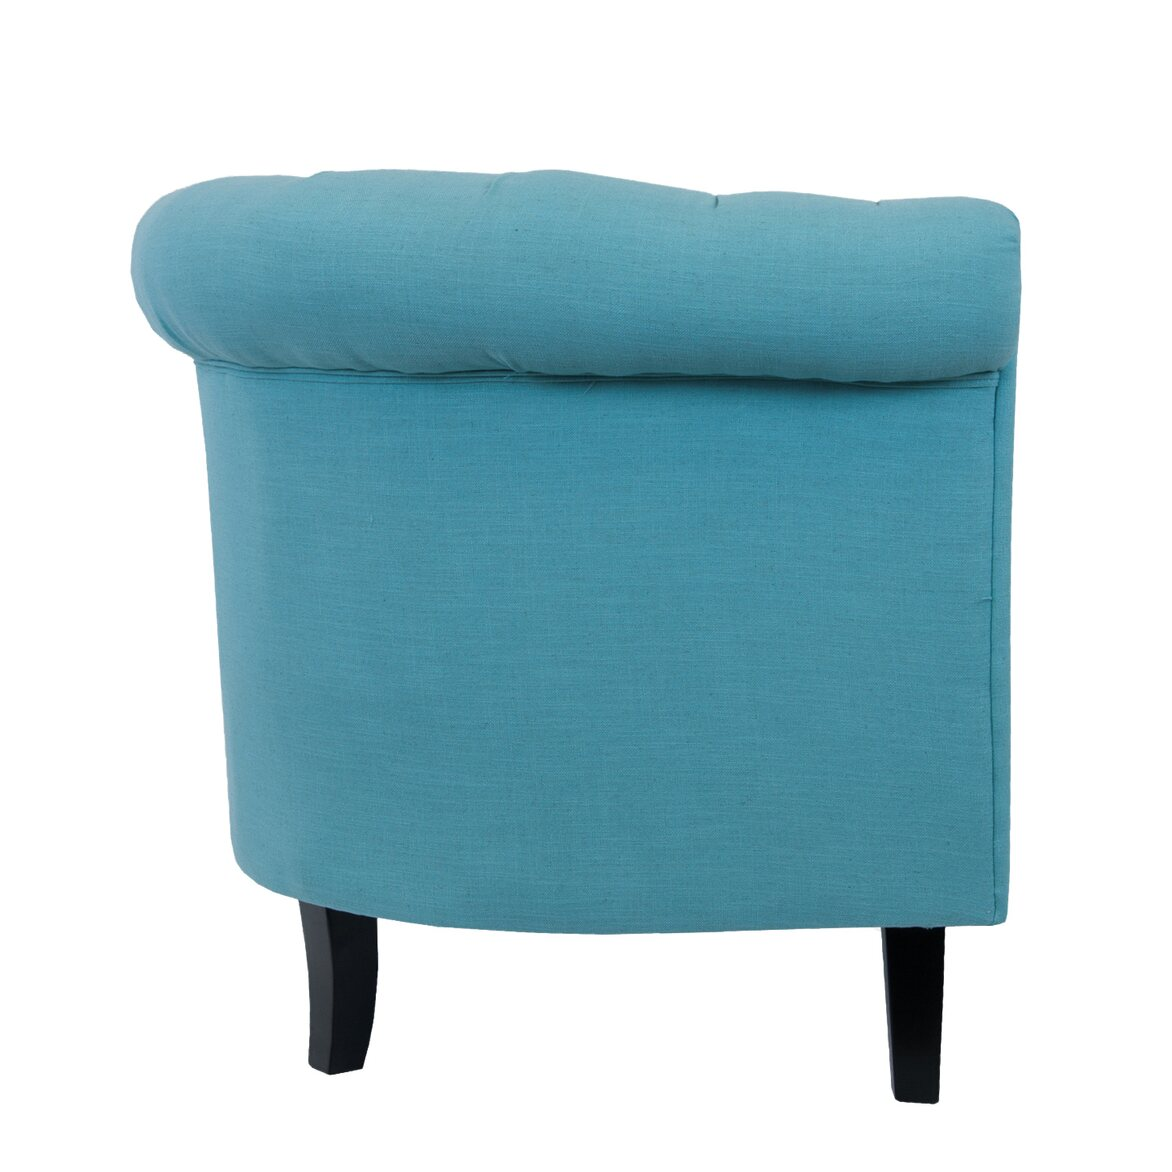 Кресло Swaun turquoise 2 | Каминные кресла Kingsby